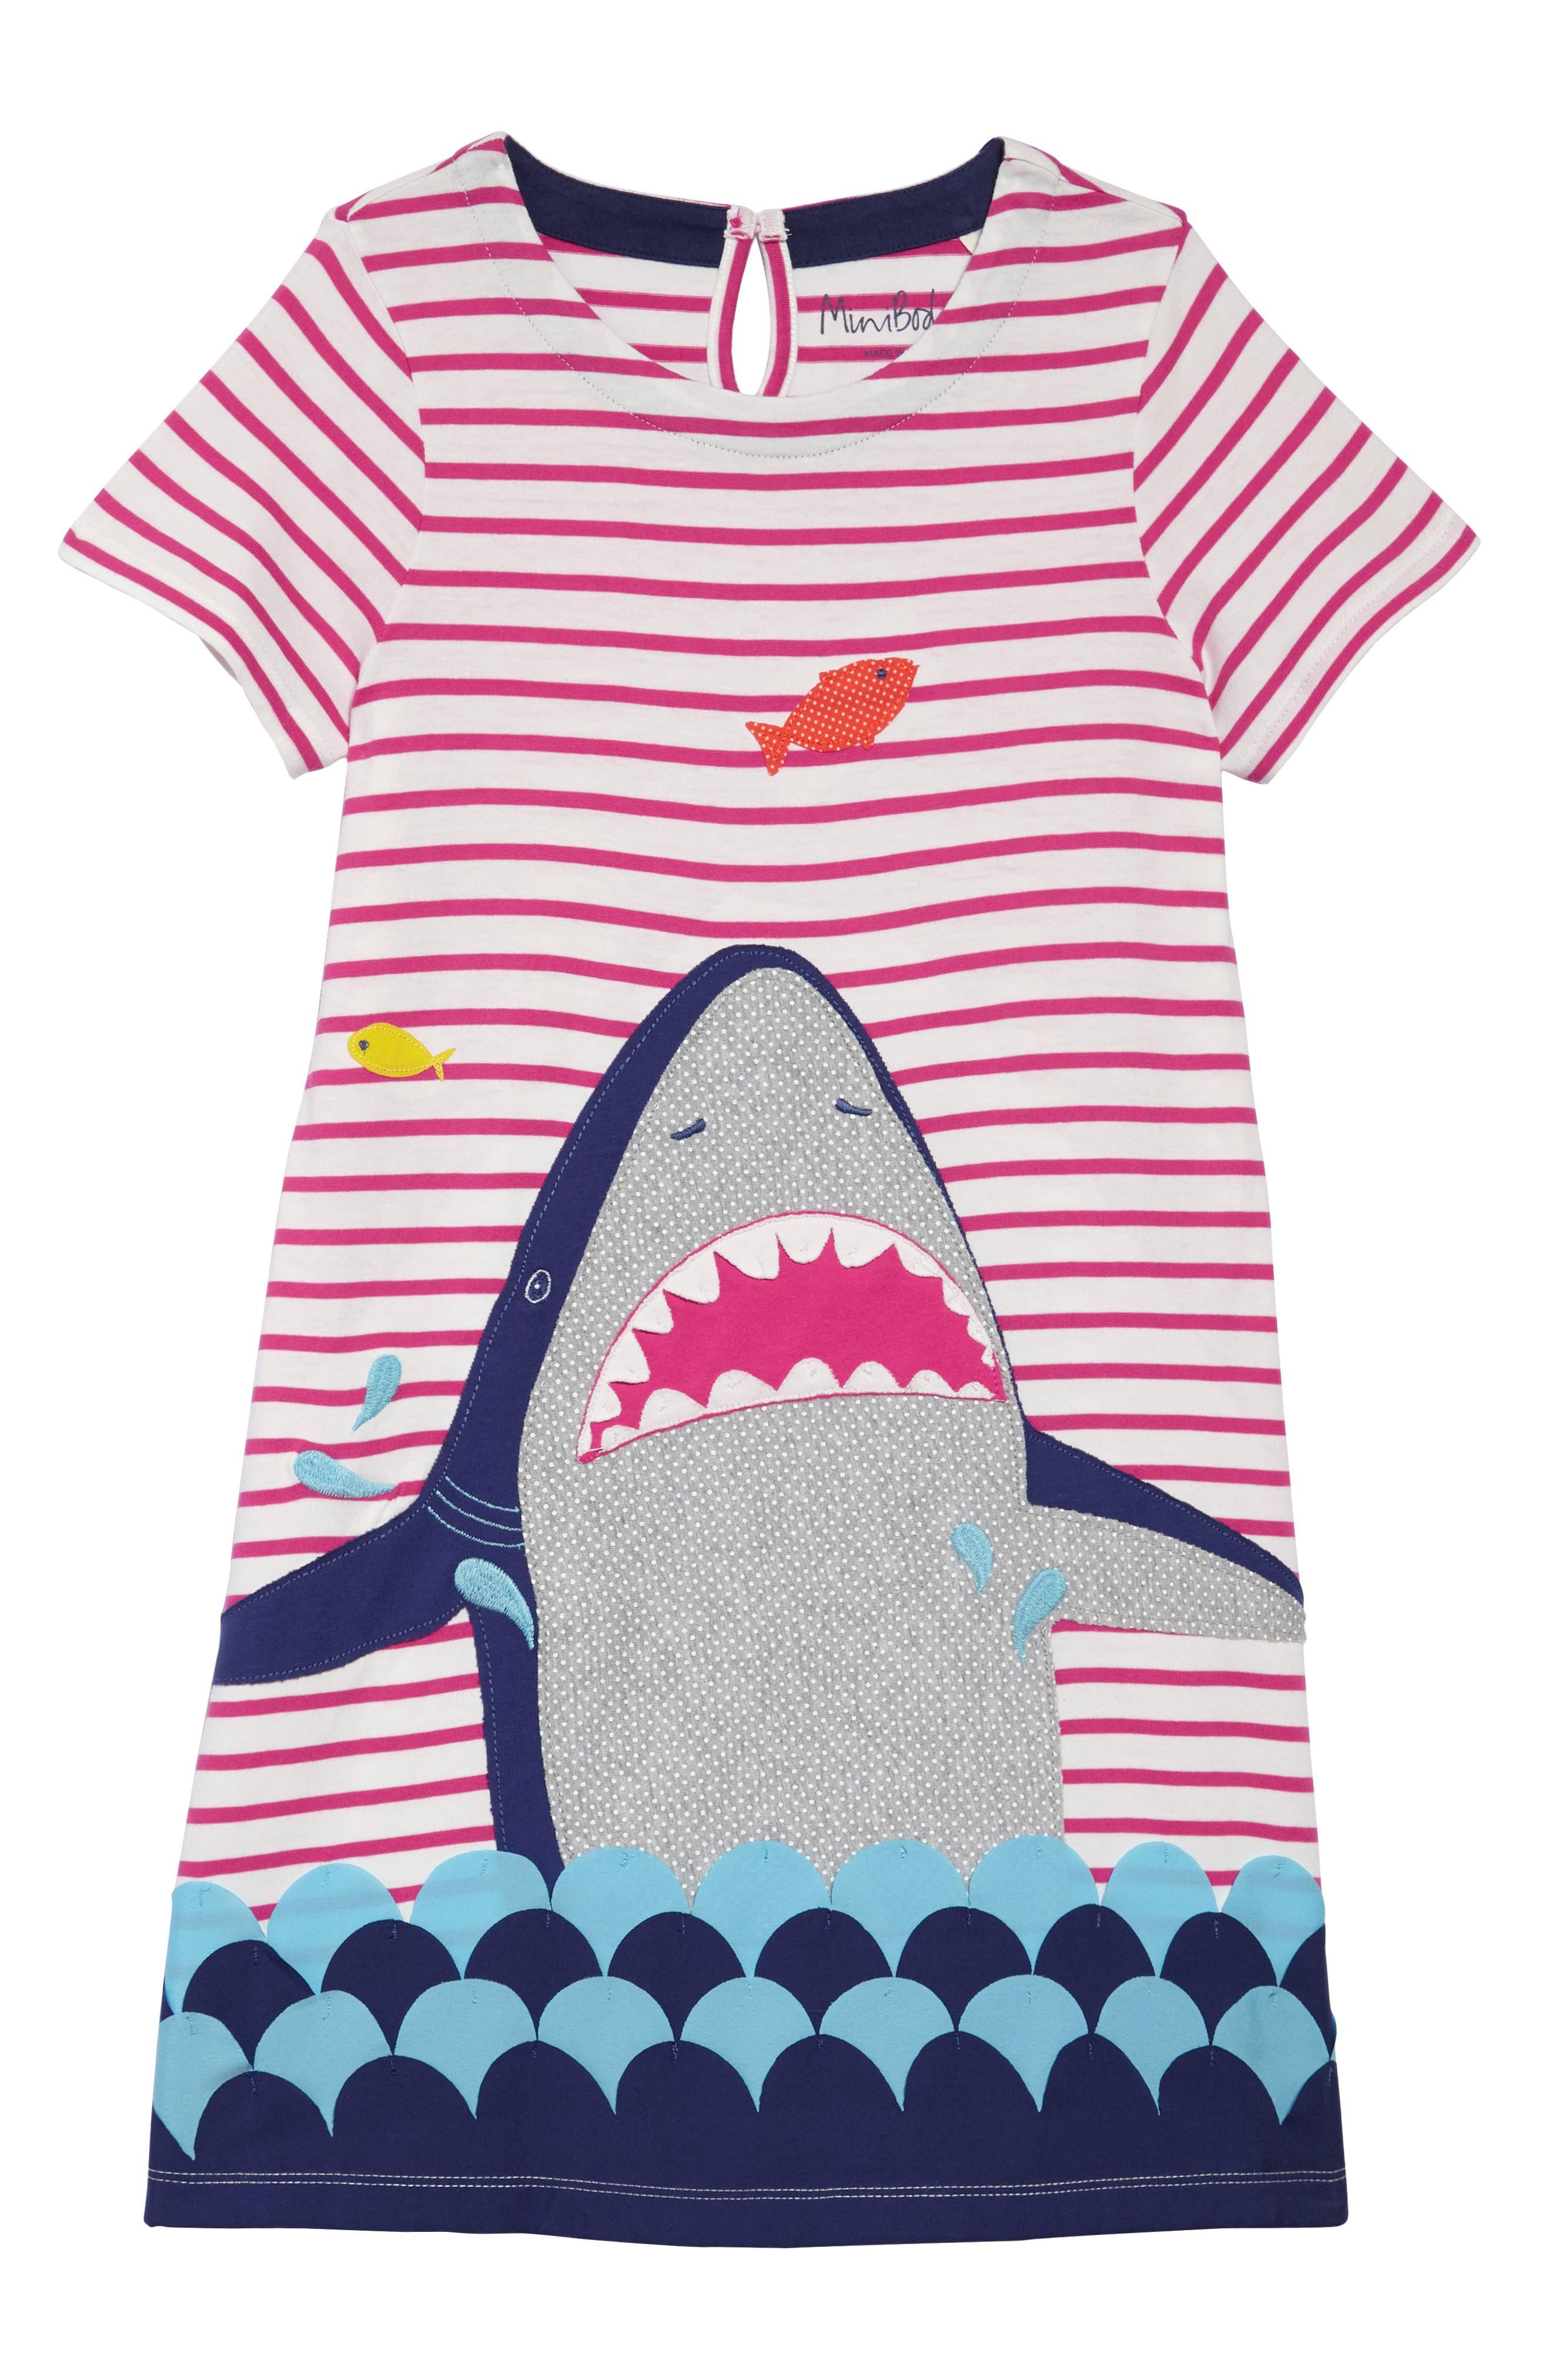 Summer Appliqué T-Shirt Dress,                             Main thumbnail 1, color,                             Mid Pink Stripe Shark Pnk